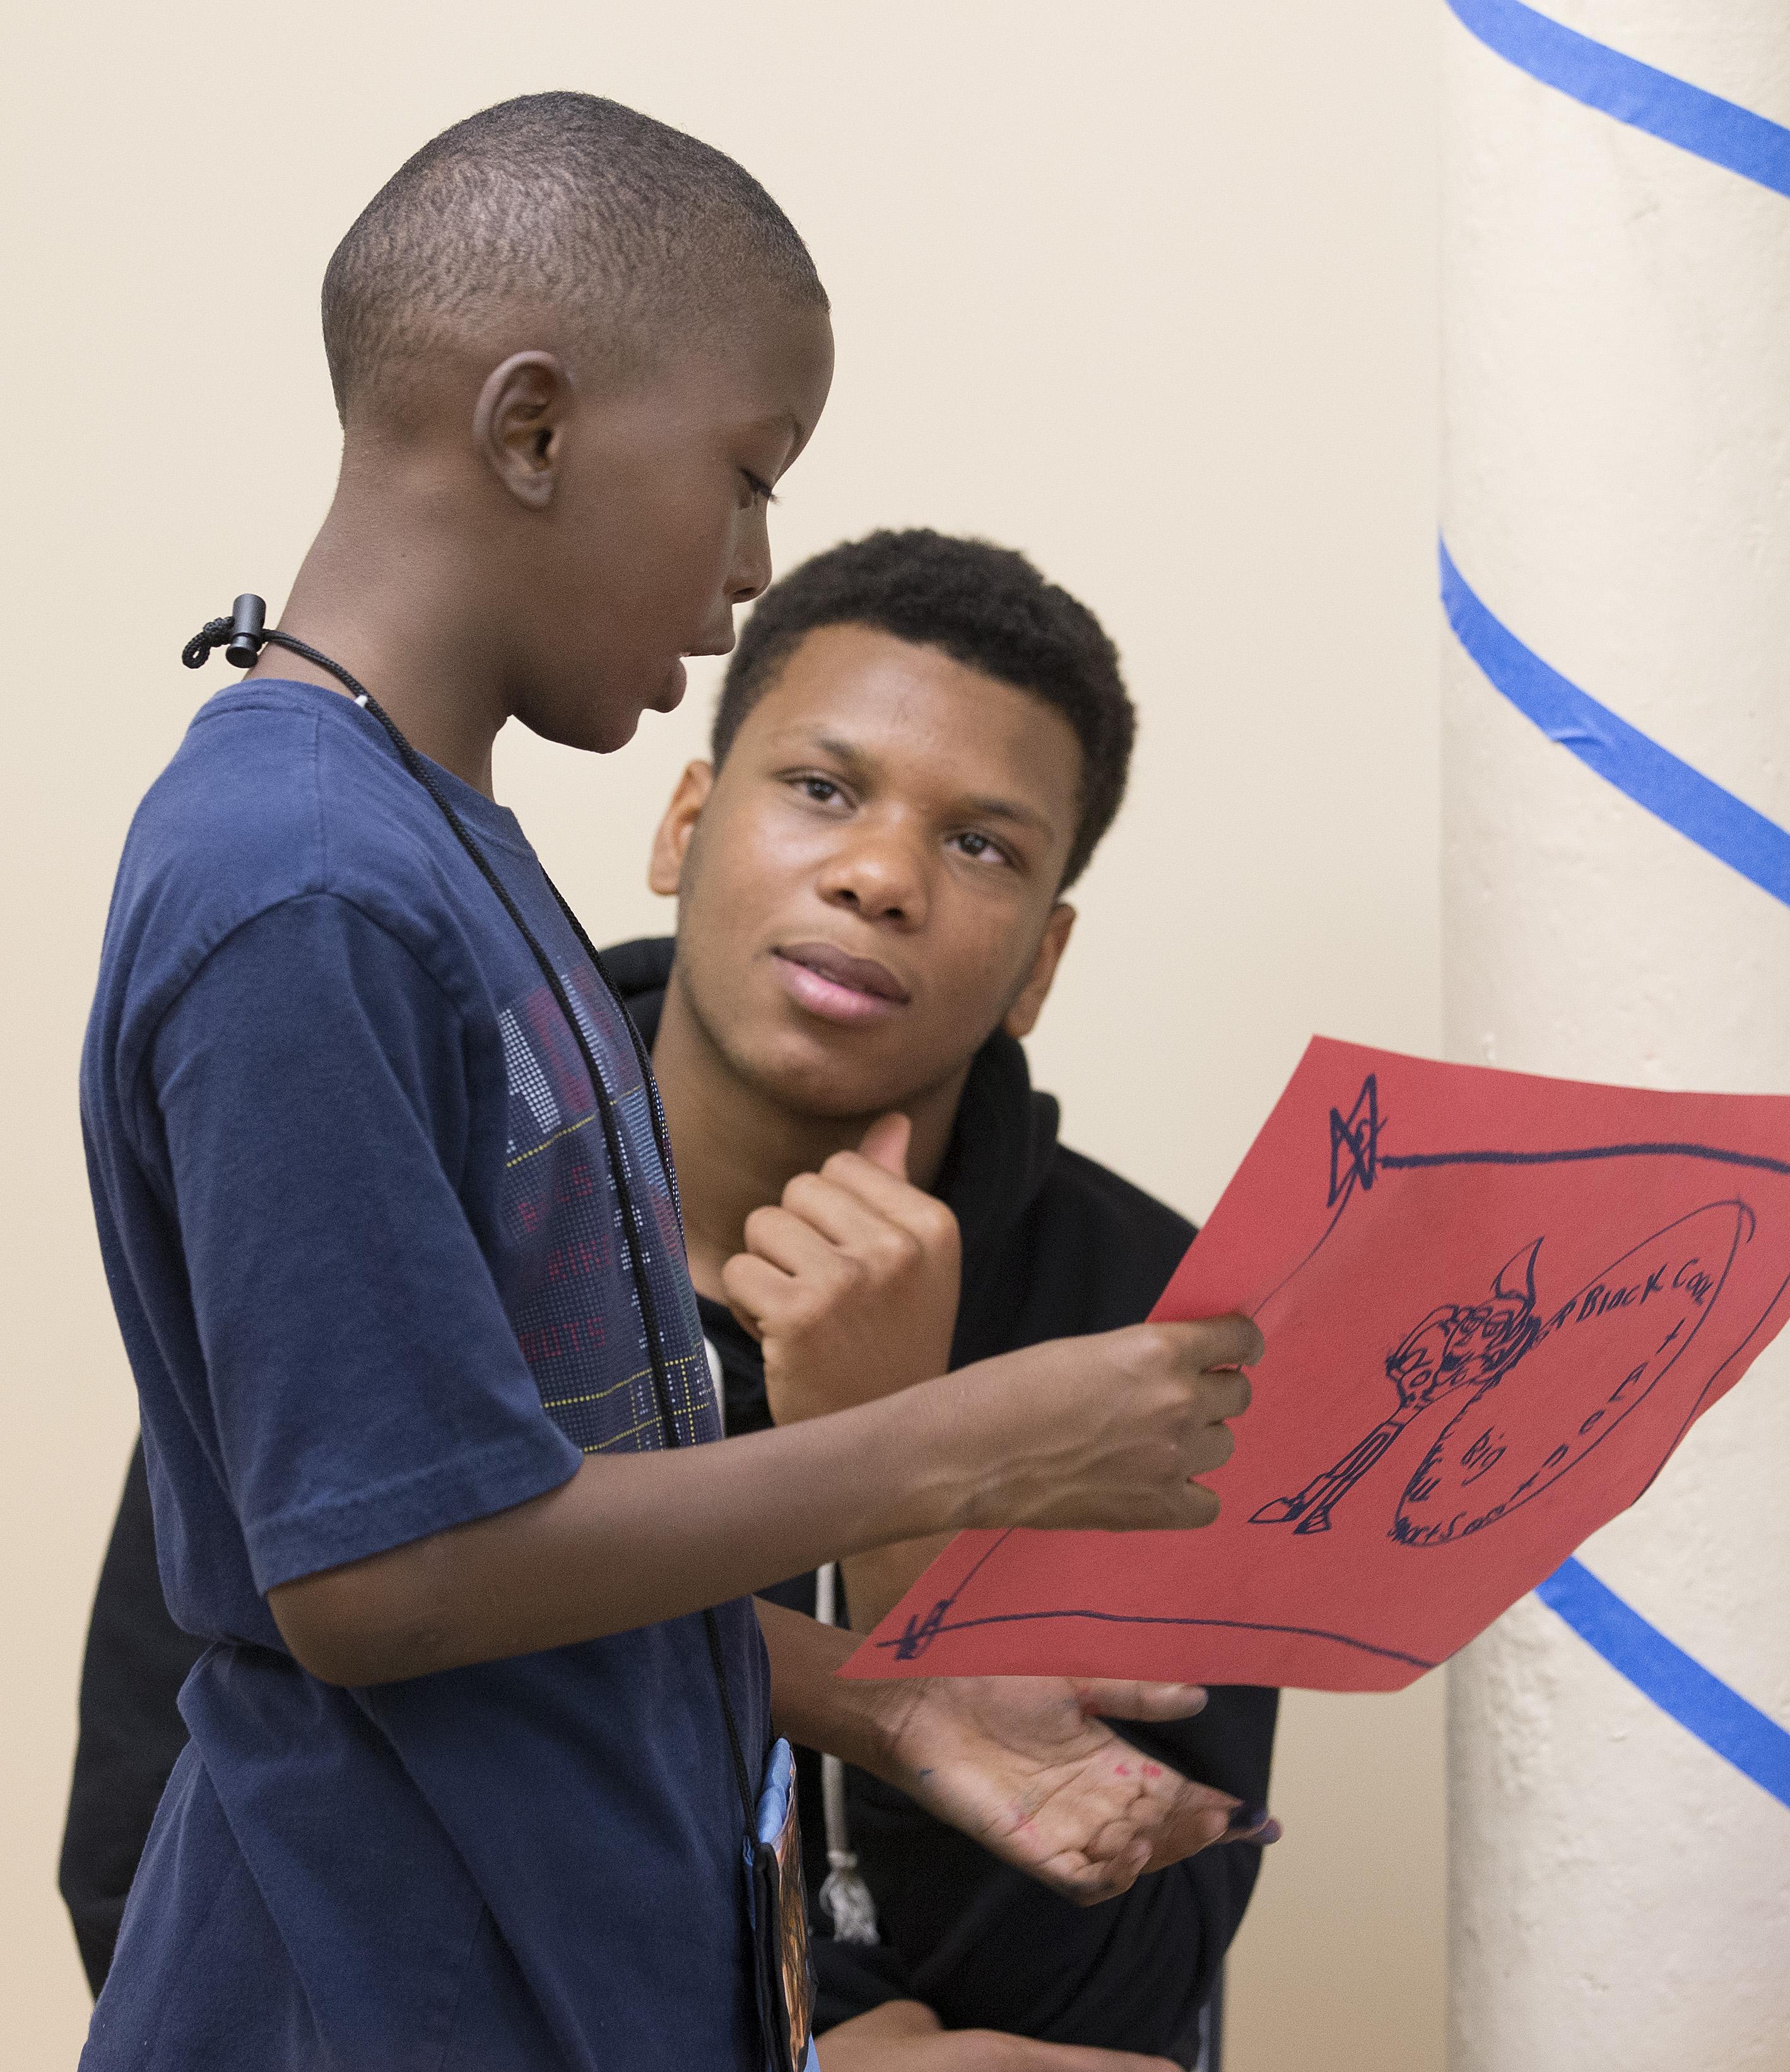 Teen volunteer Tra'Sean, right, encourages 6th-grader J.B. to explain his drawing at the Freedom School at Gordon Memorial United Methodist Church in Nashville, Tenn.